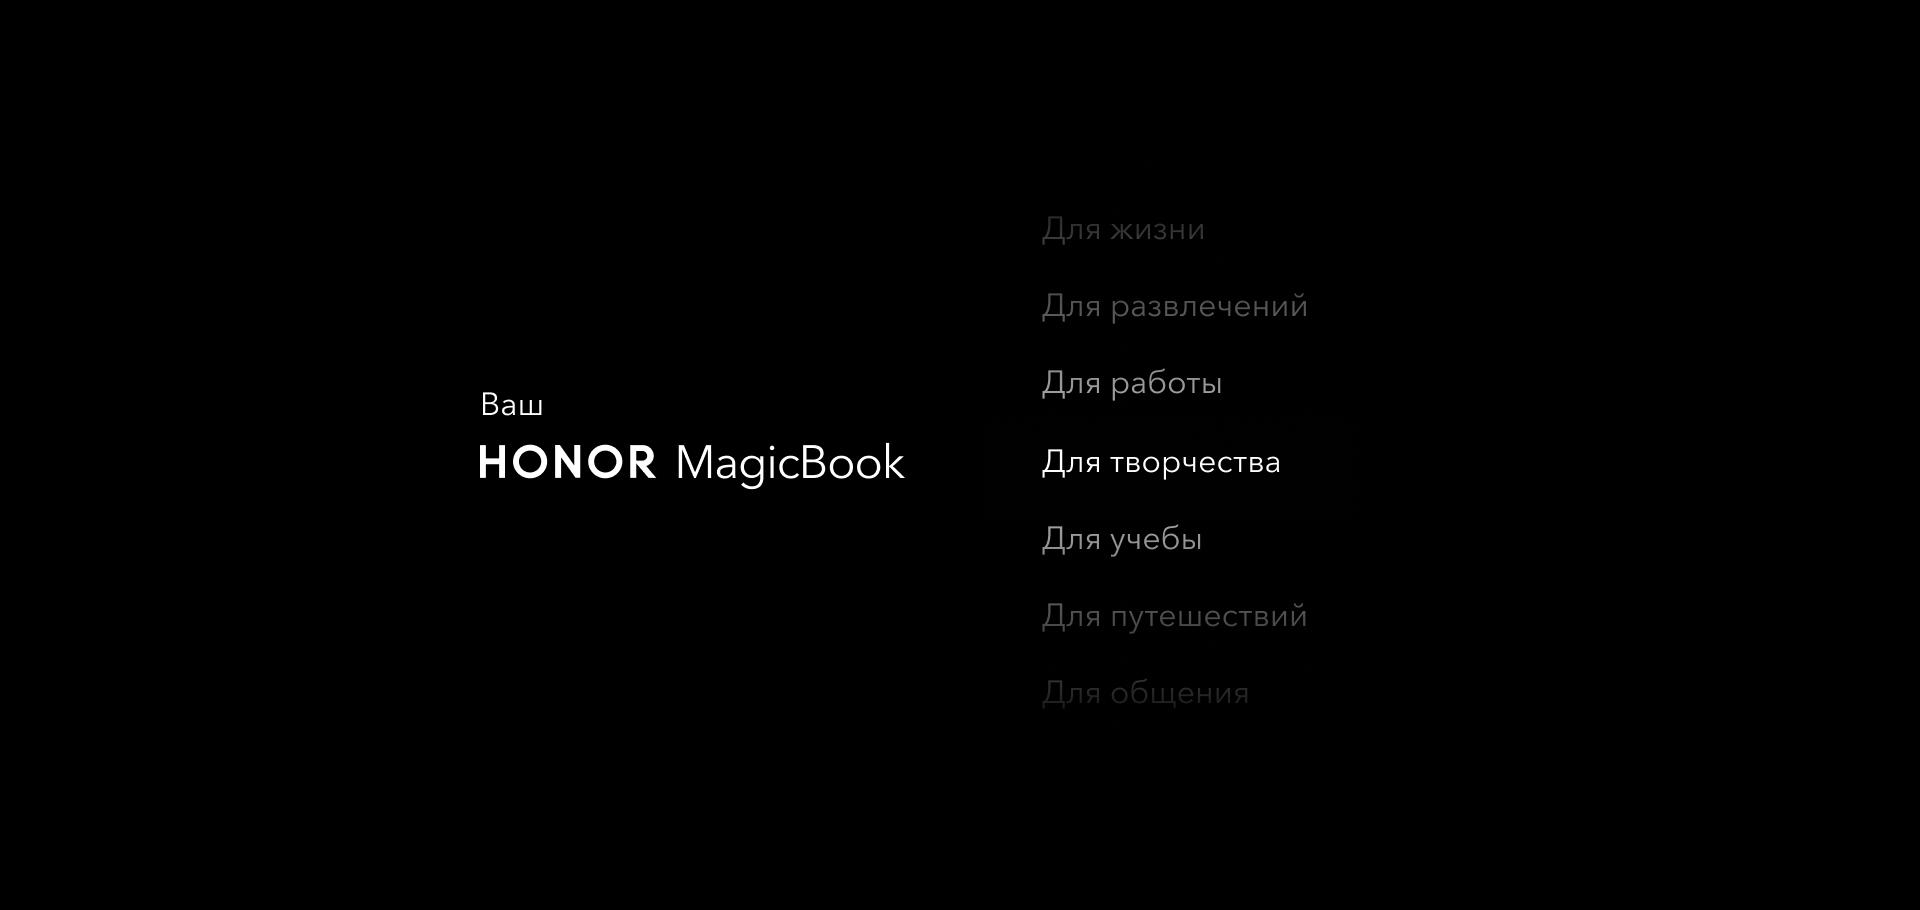 Ваш HONOR MagicBook.